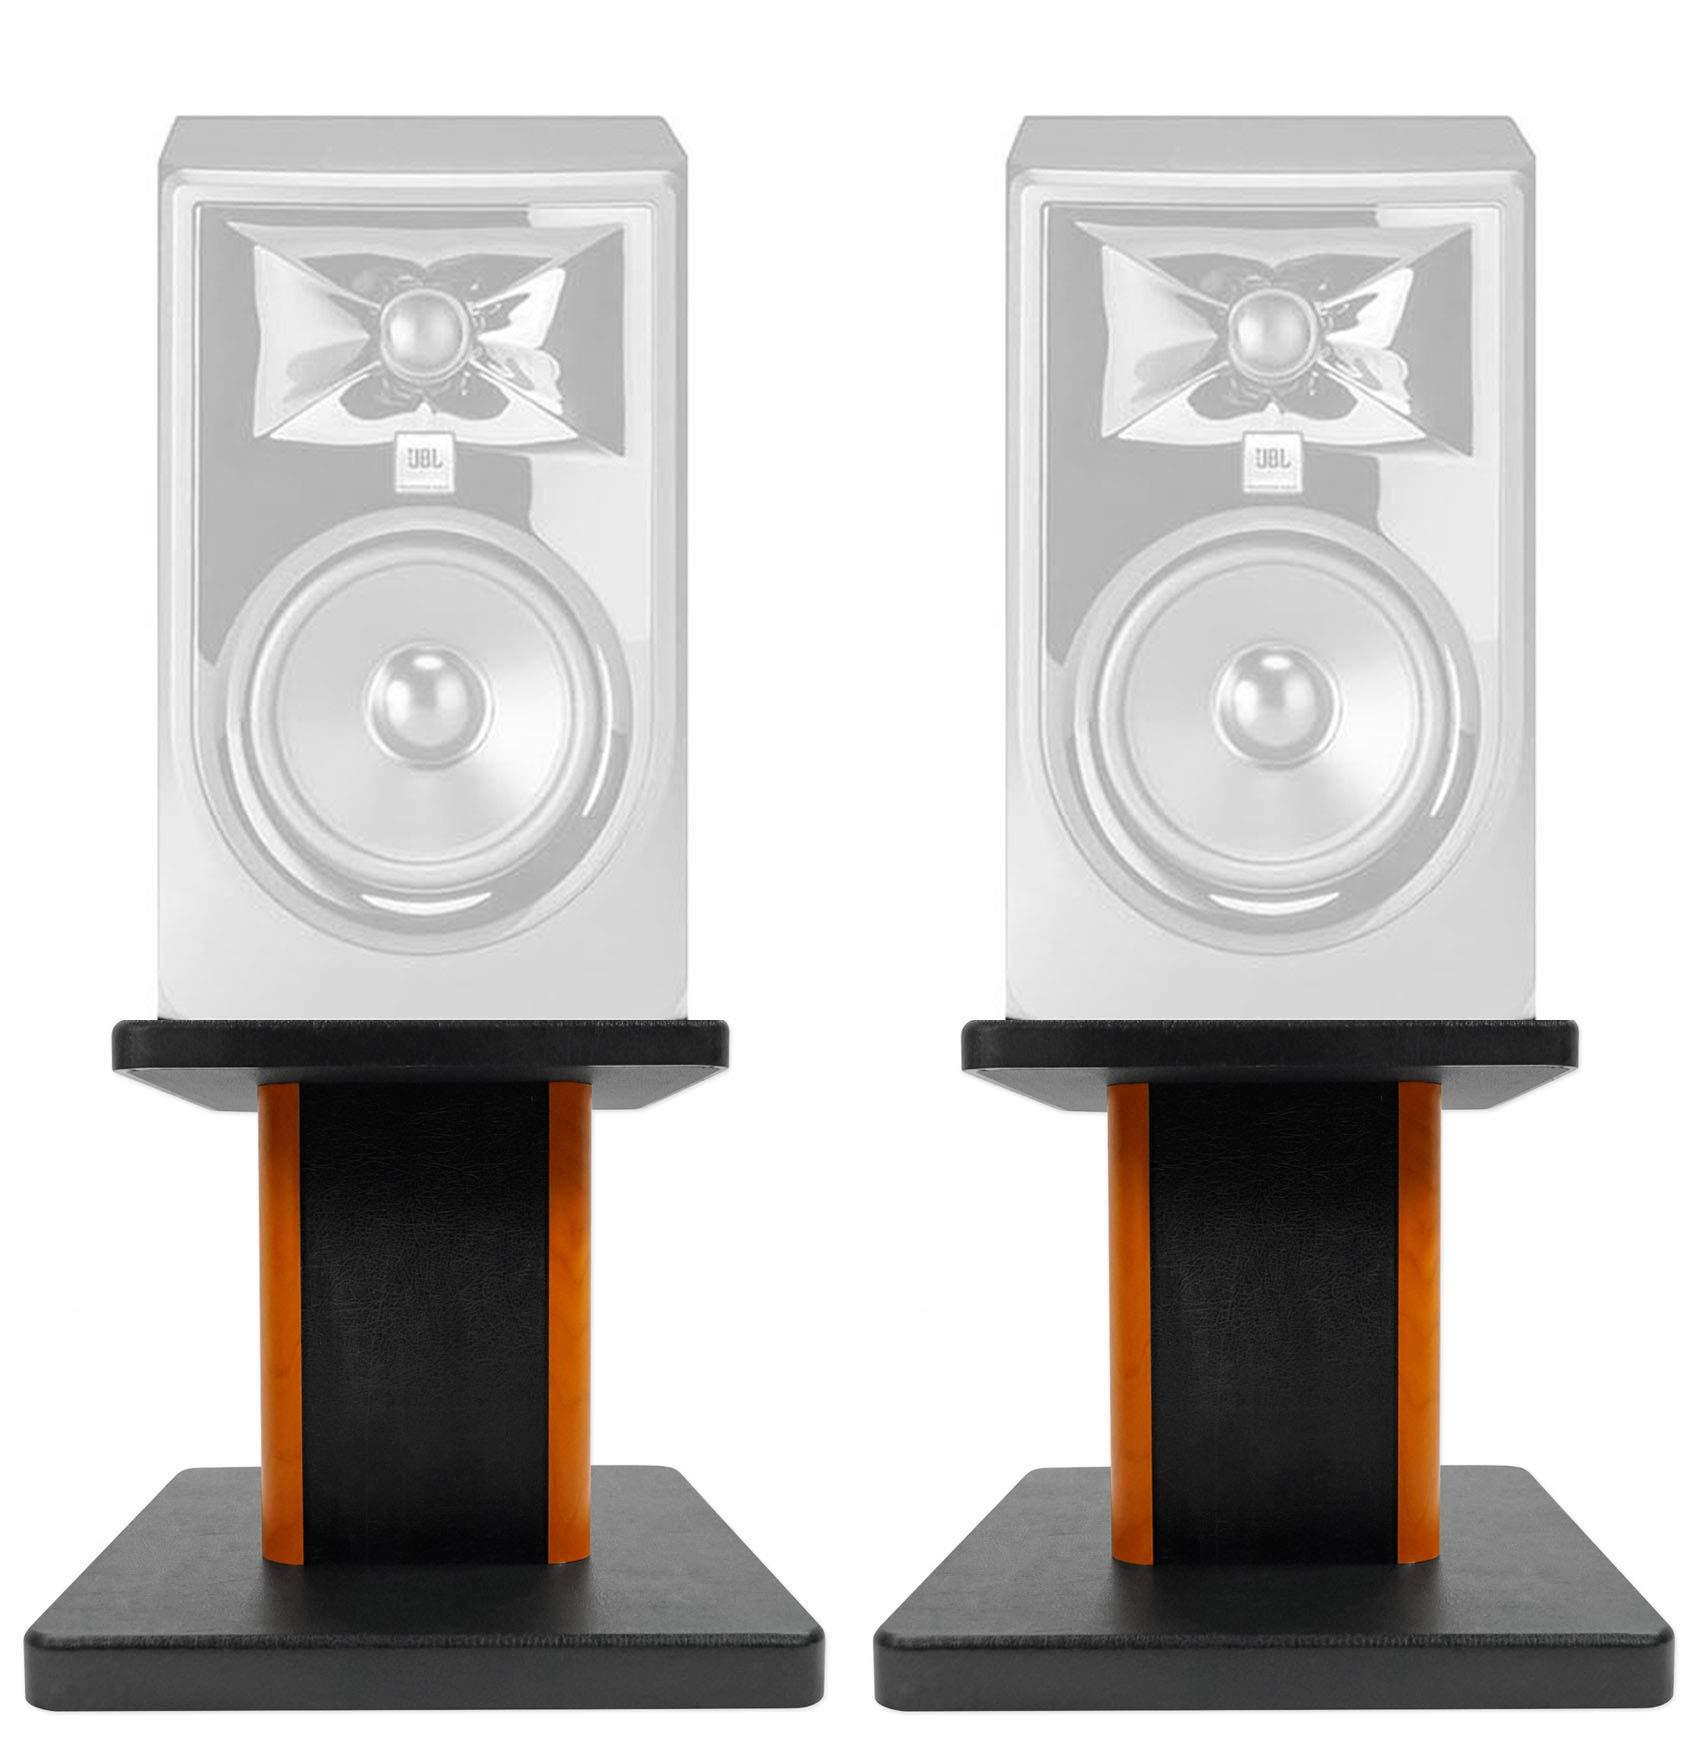 ROCKVILLE 8'' Wood Studio Monitor Speaker Stands for JBL 308P MKII Monitors by ROCKVILLE